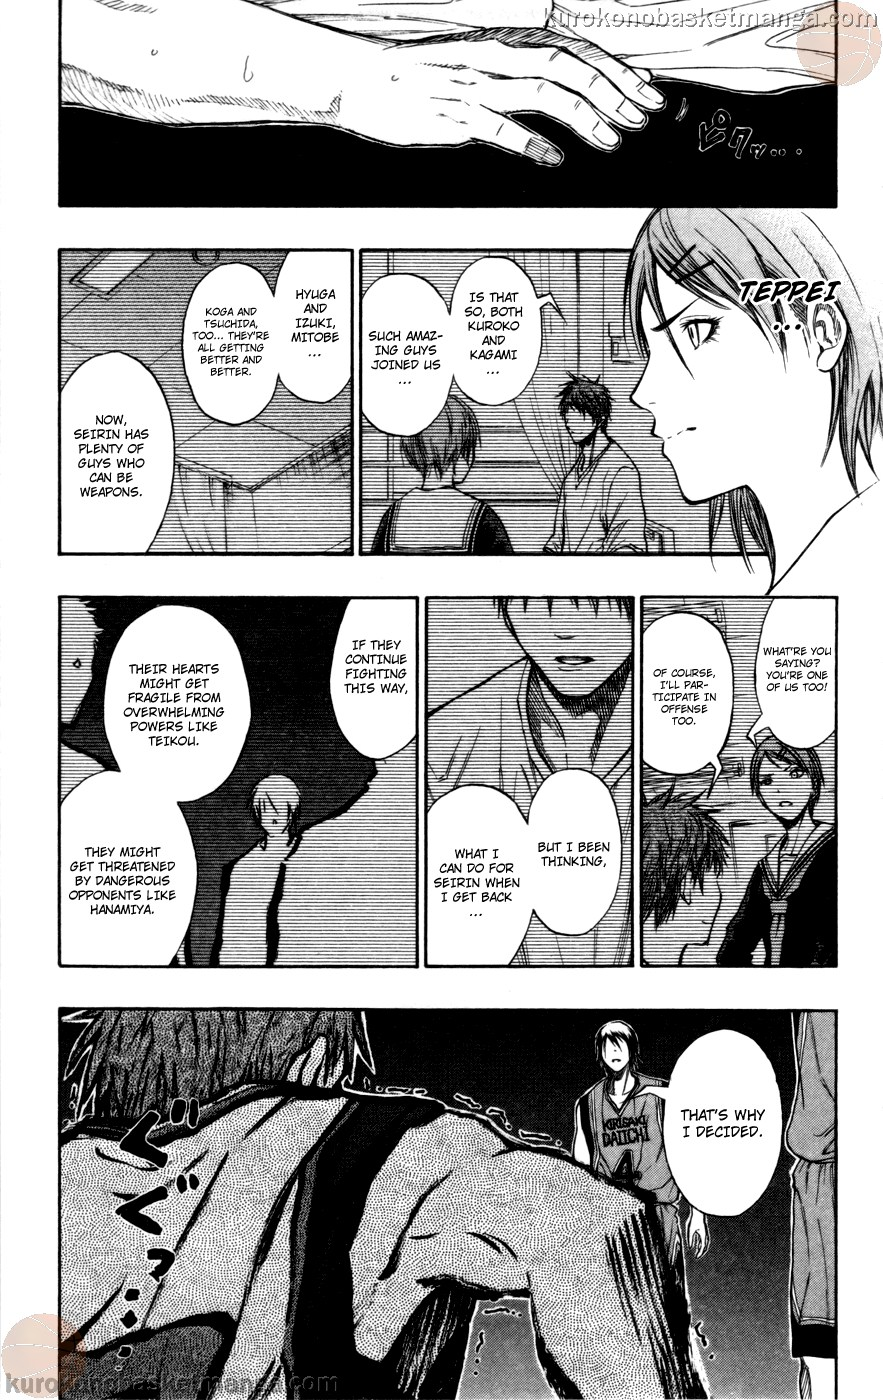 Kuroko no Basket Manga Chapter 102 - Image 17